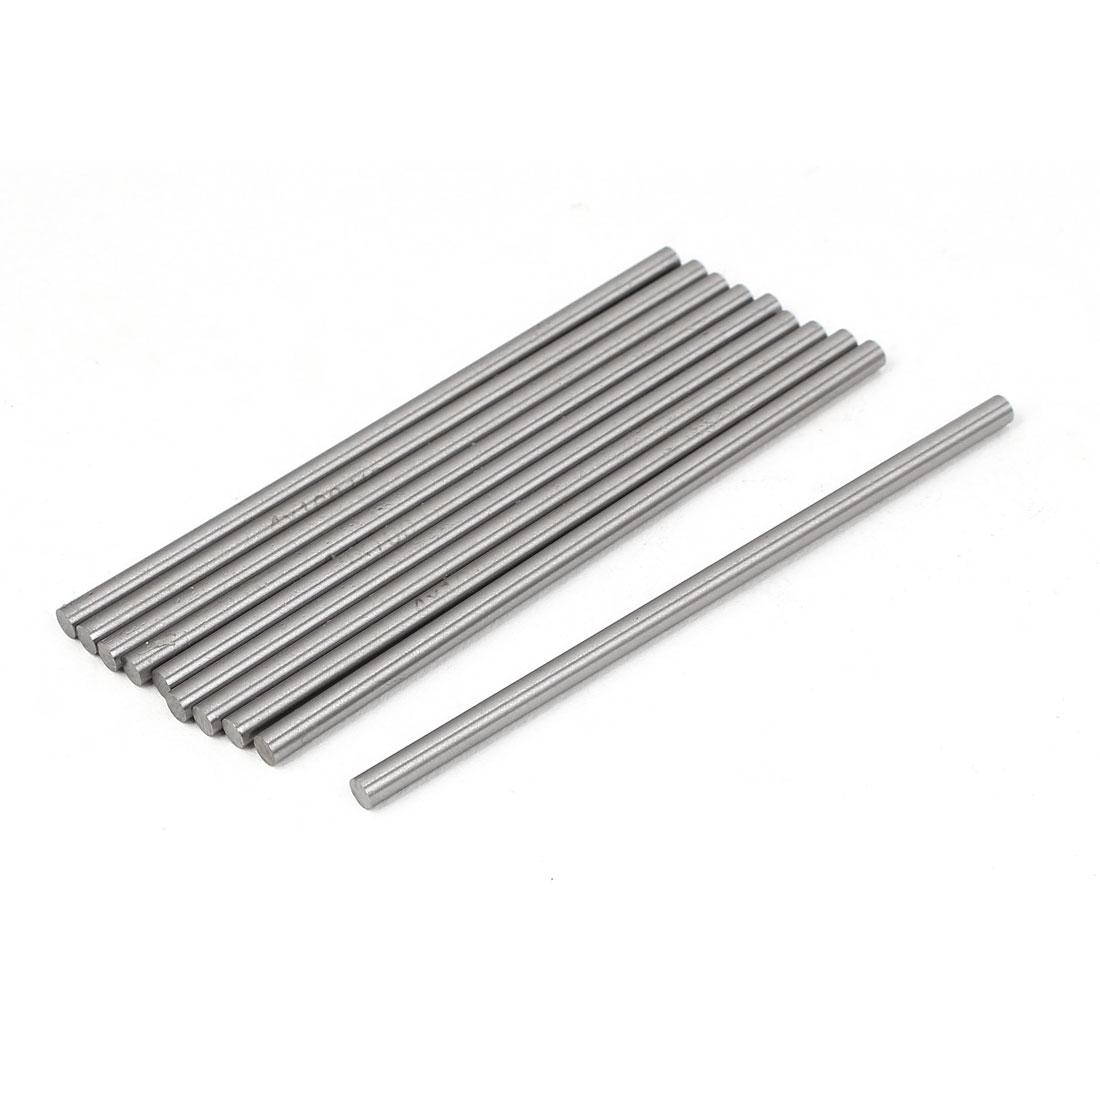 4mm x 100mm HSS Machine Boring Tool Solid Round Lathe Bar 10pcs